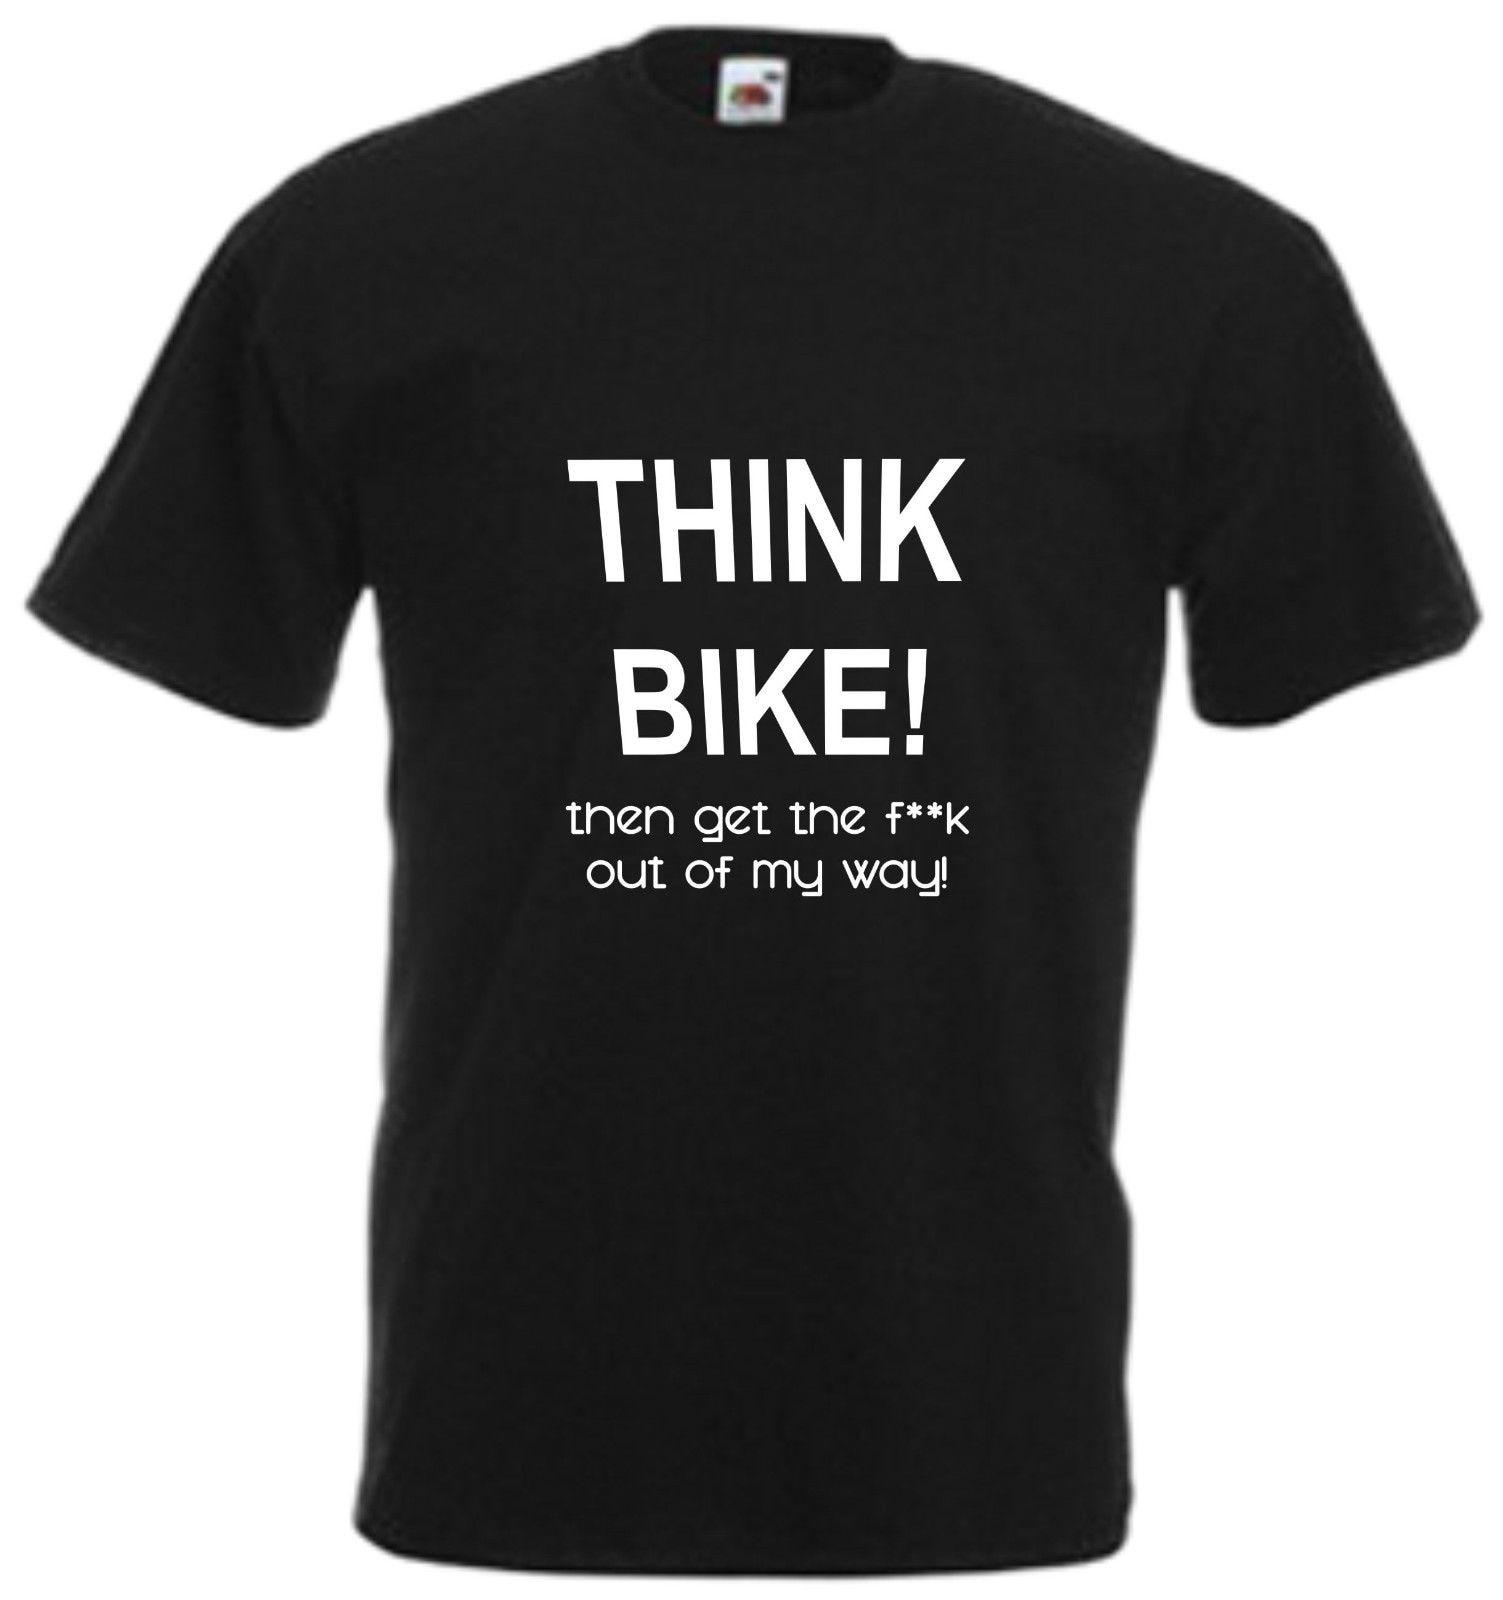 Men Summer T Shirt Think Biker Then Get Out My Way Comedy T Shirt Funny Motorbike Tee Biker Gift Top High Quality